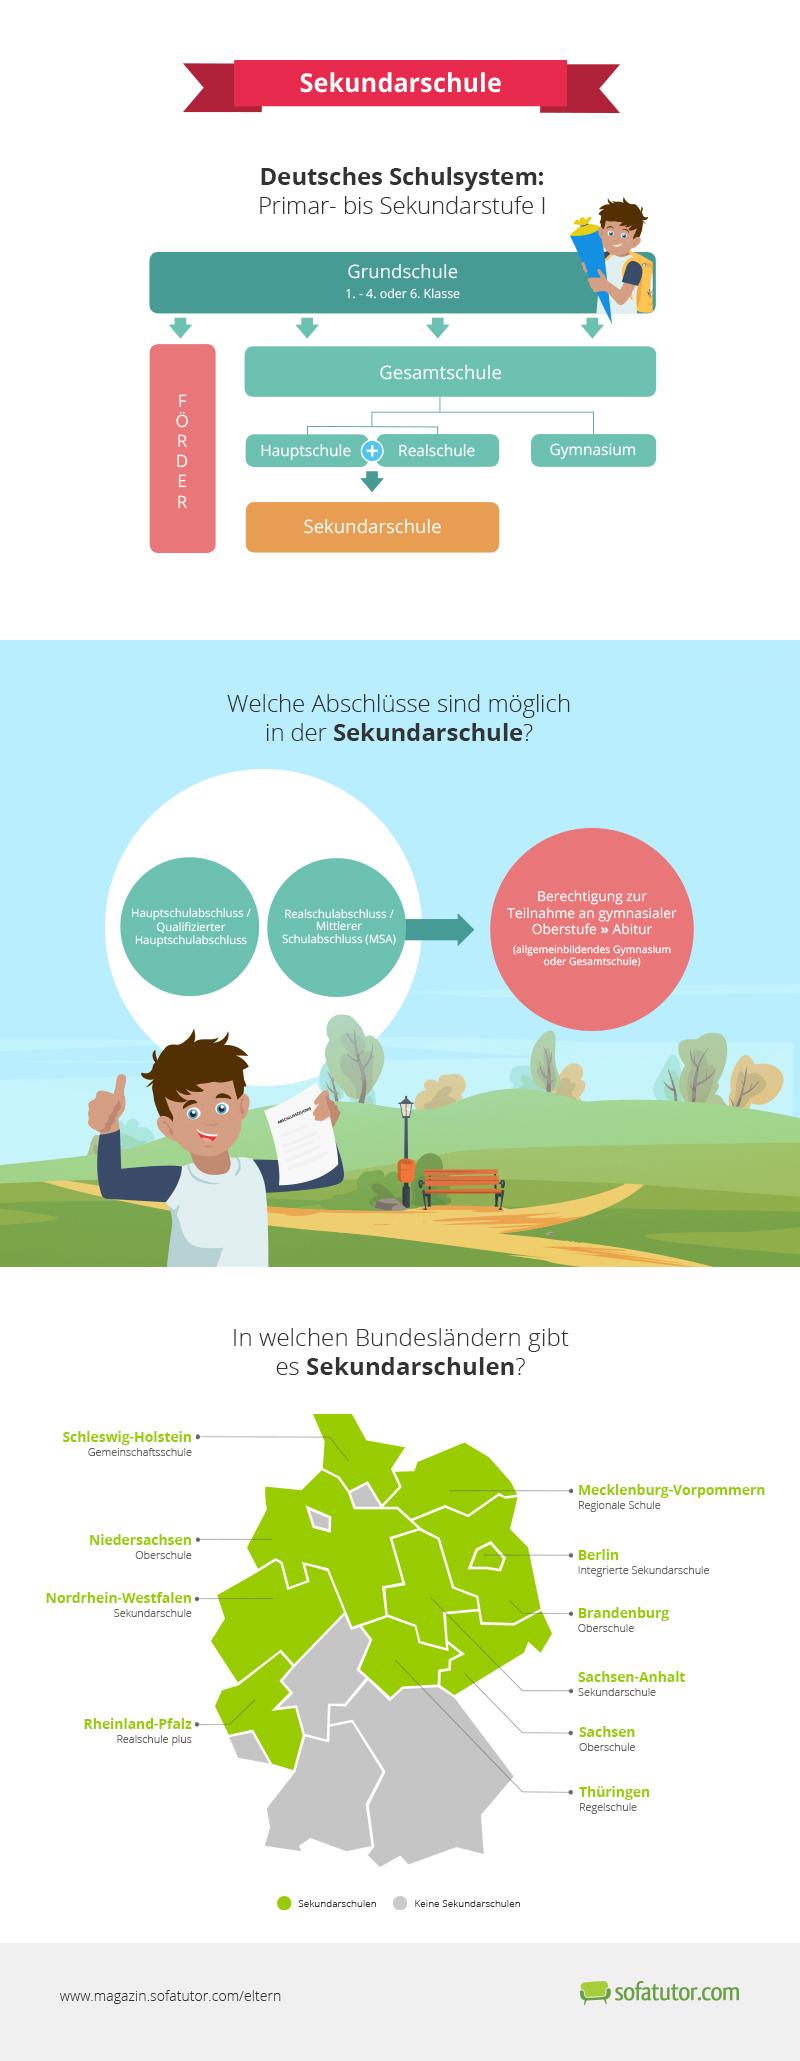 Infografik, Sekundarschule, weiterführende Schule, Schulabchluss, Realschule, Hauptschule